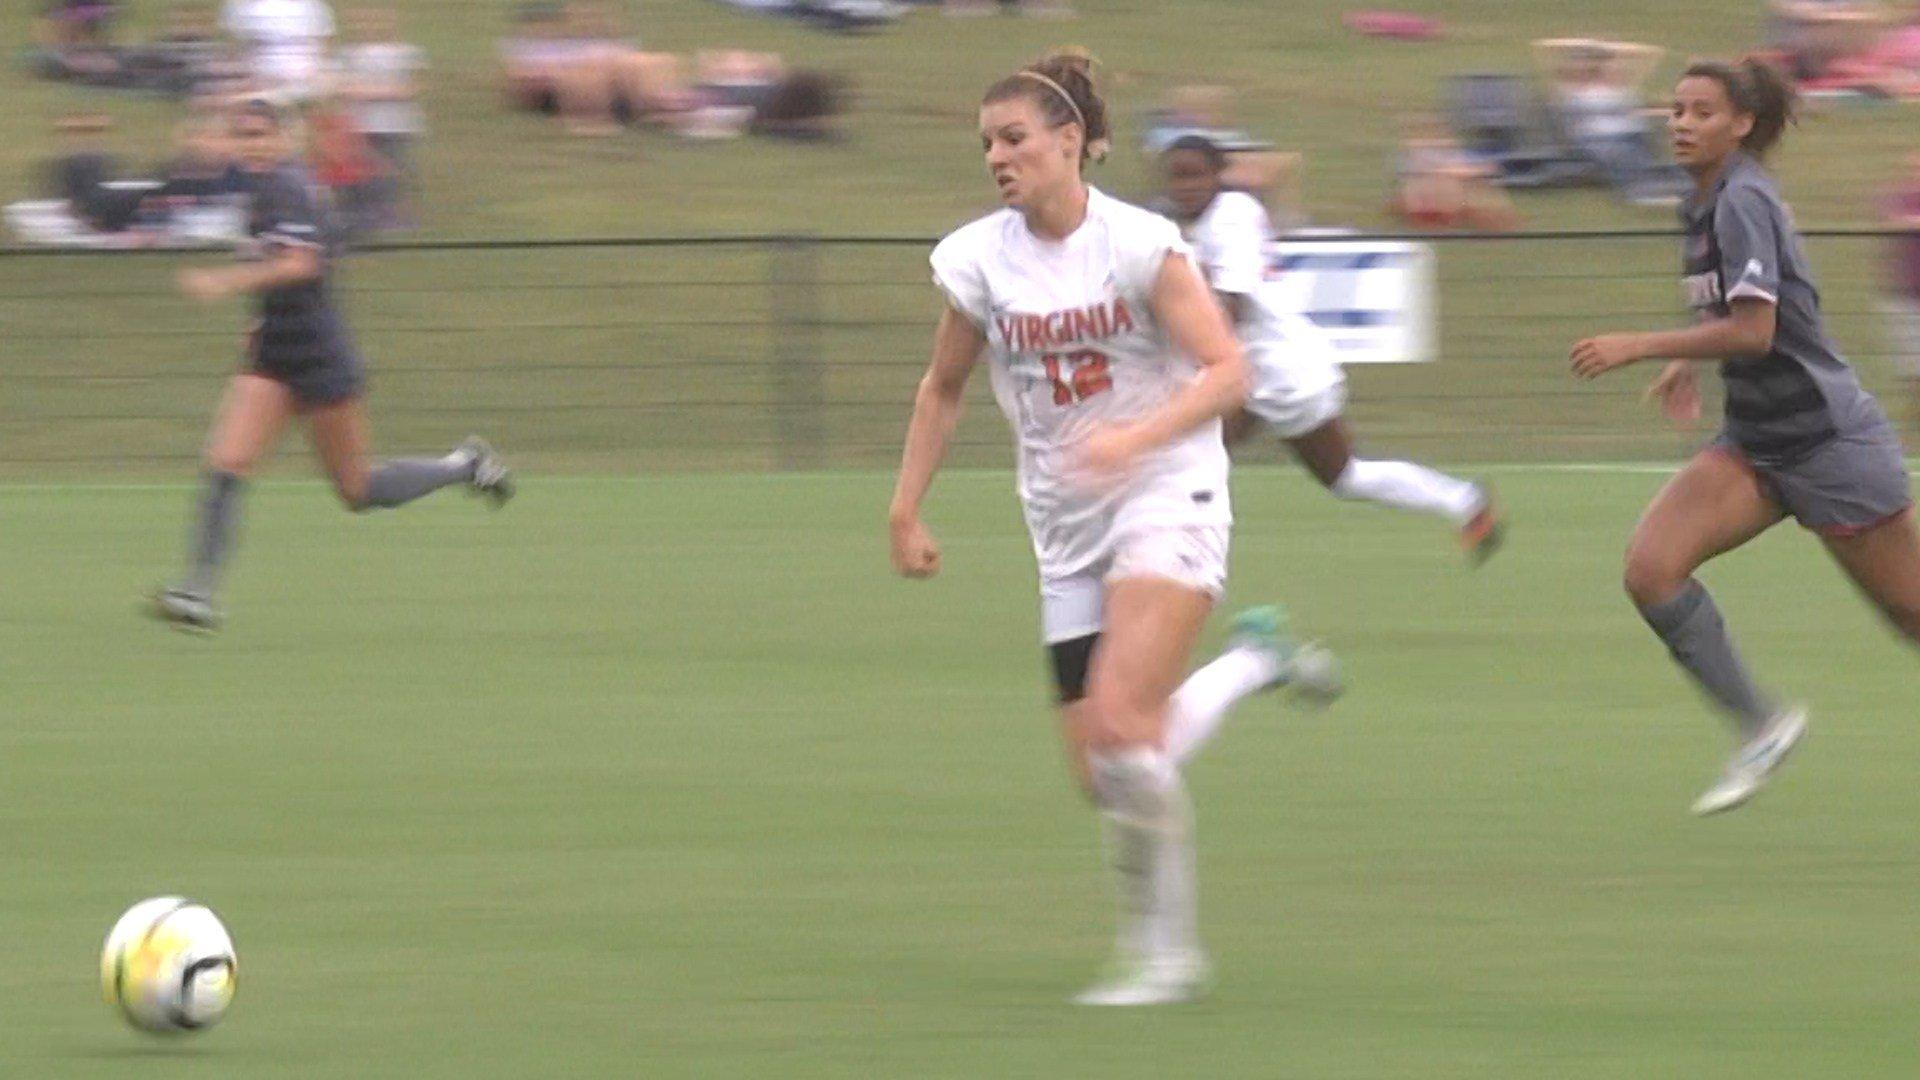 Veronica Latsko scored her fifth goal of the season in OT to give UVa 1-0 win over Louisville